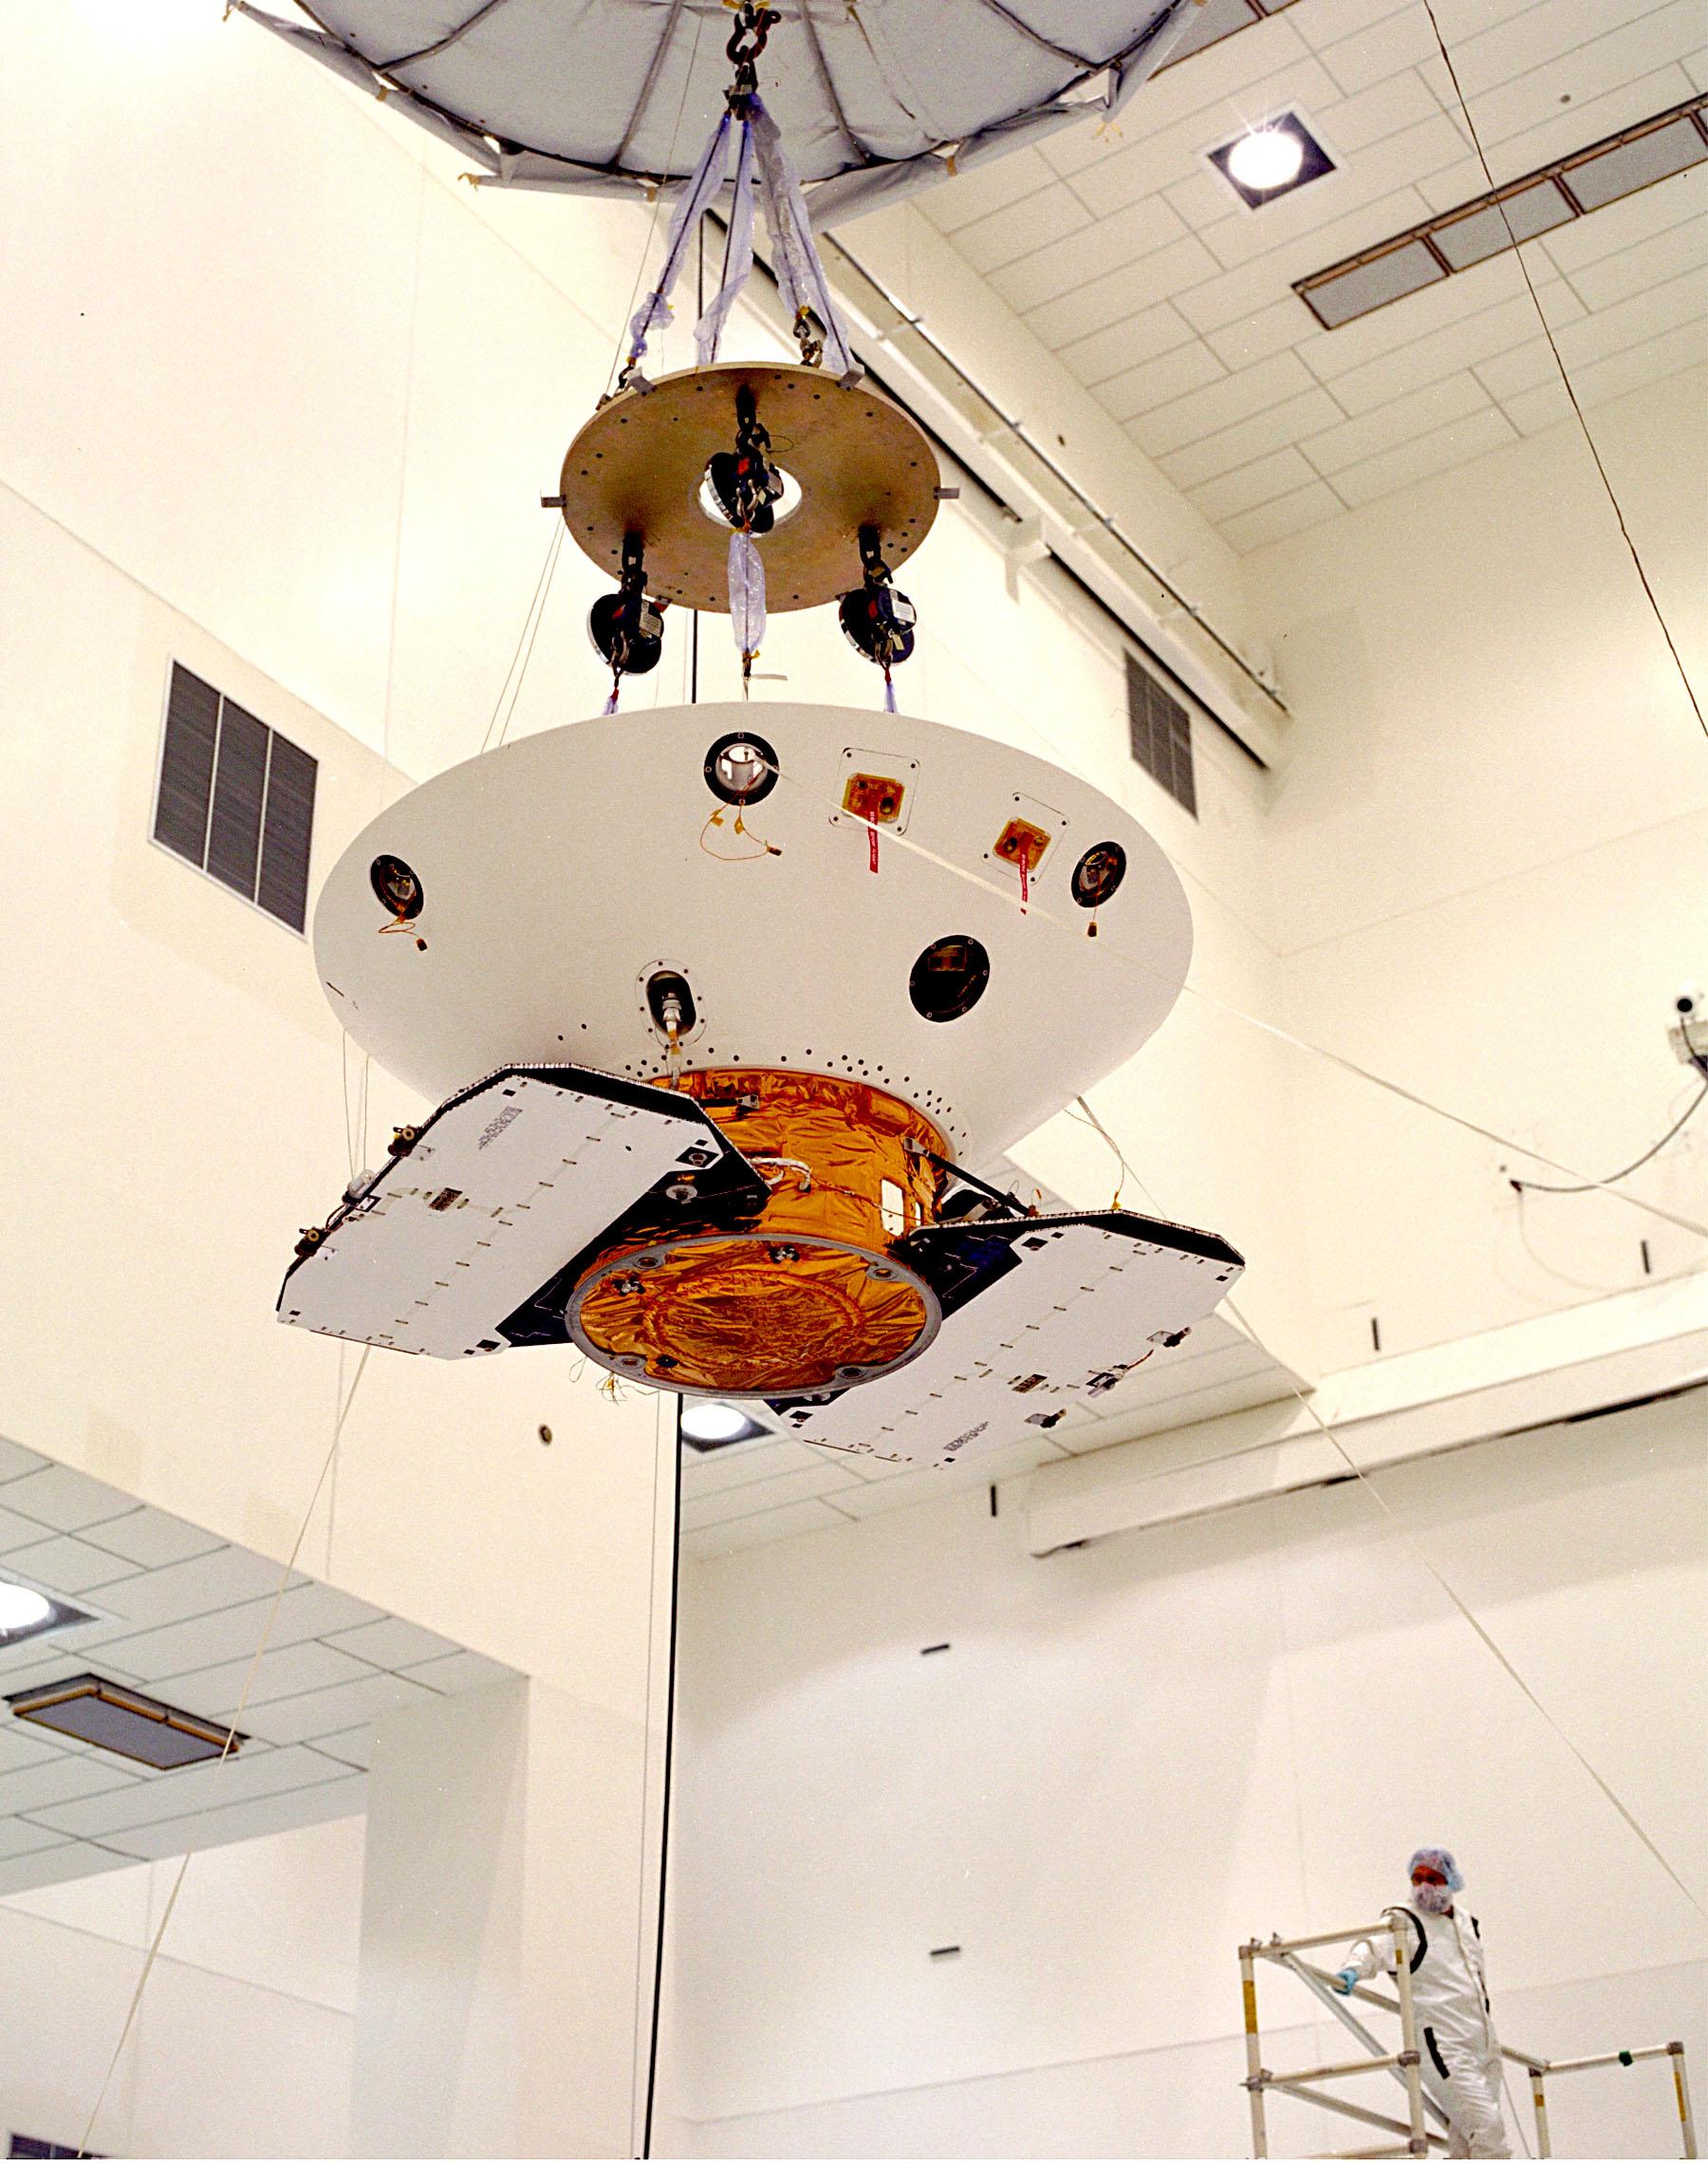 Mars Polar Lander: Clues From the Crash Site